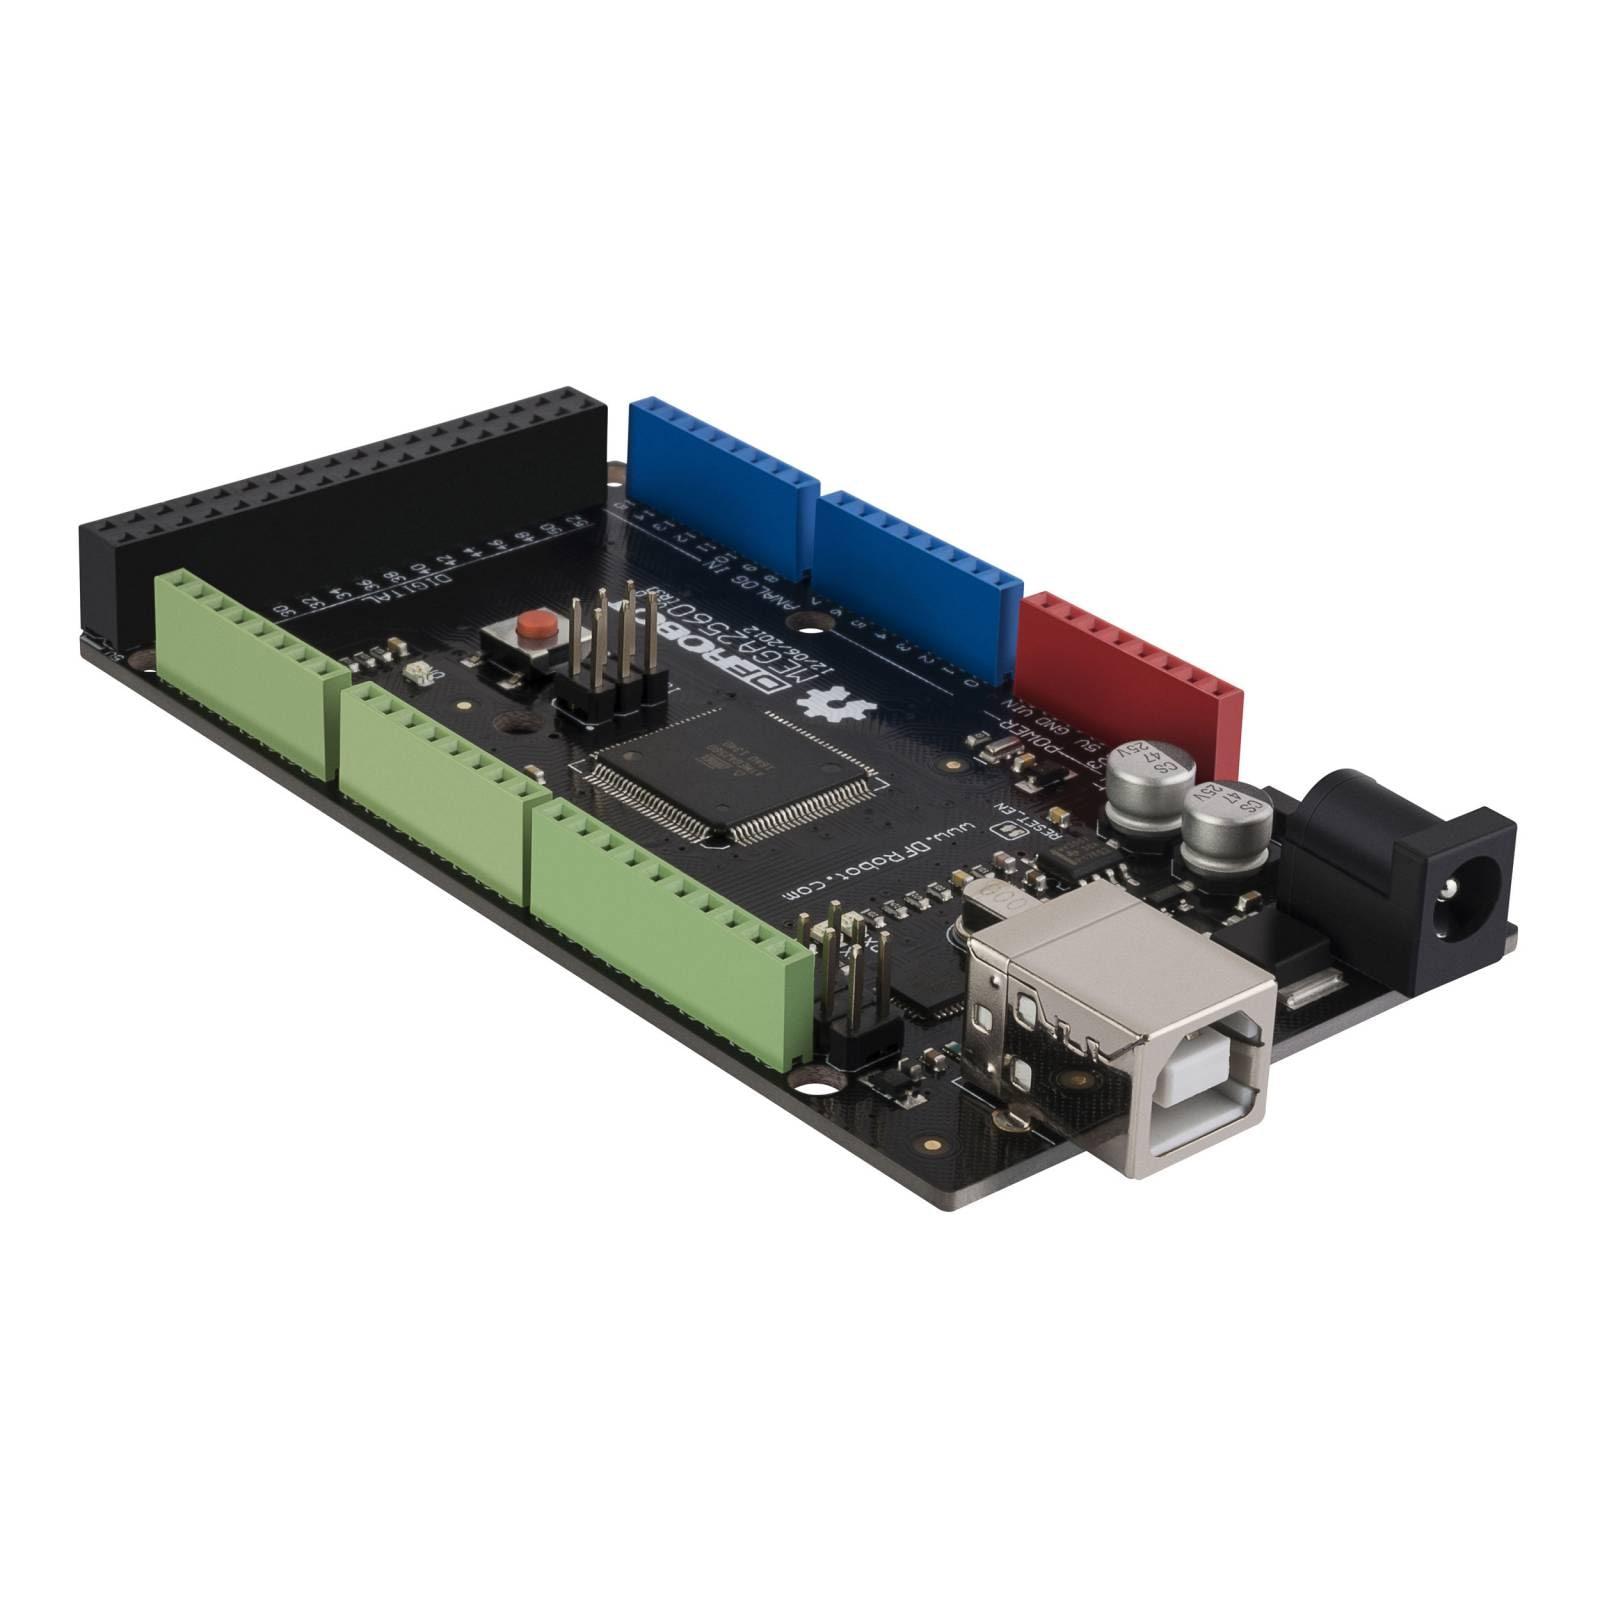 Placa con sistema Arduino MEGA